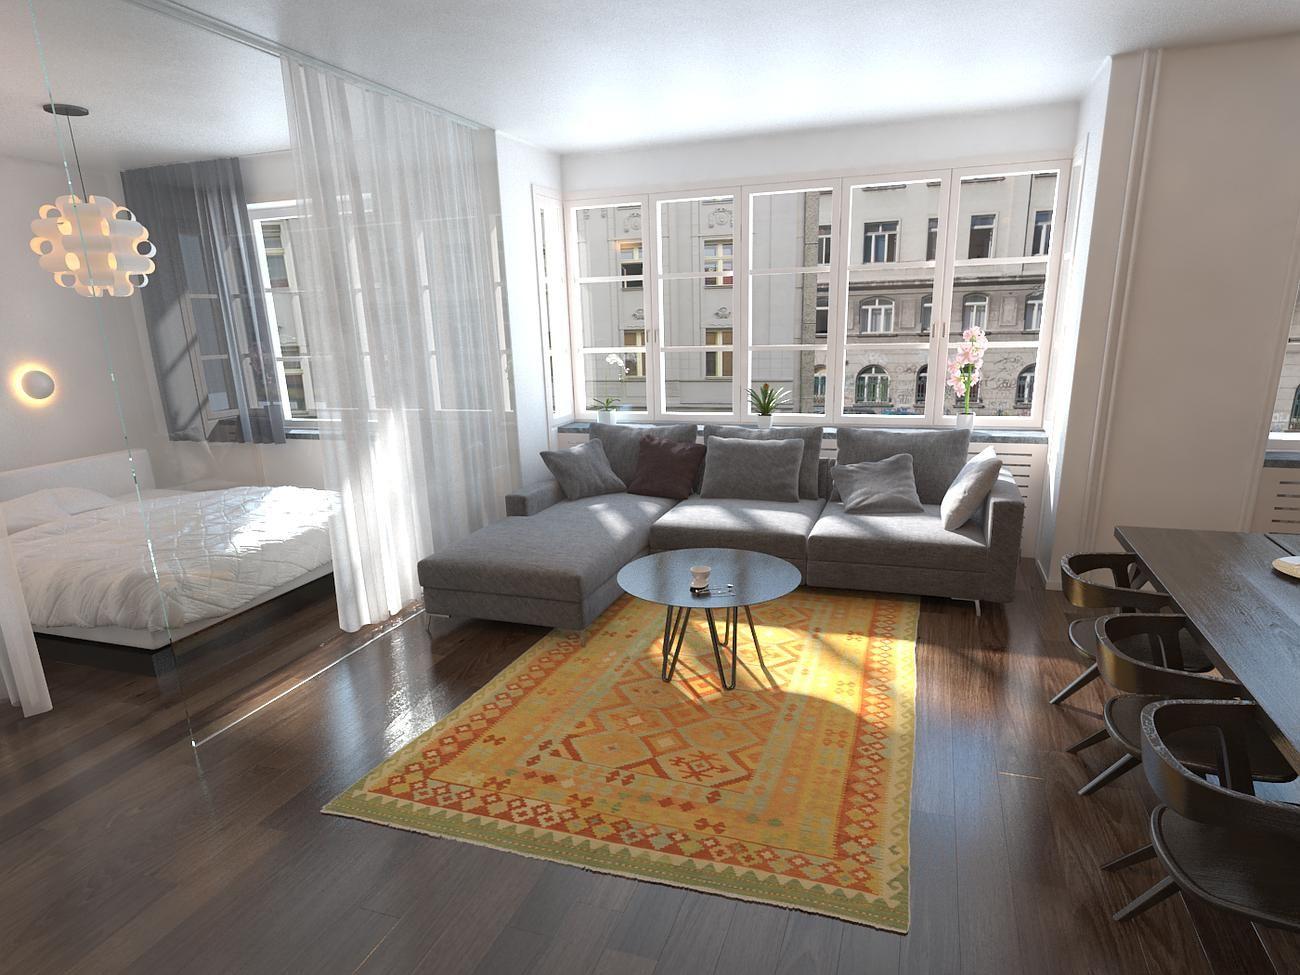 Living Room Carpet Rugs 17 Best Images About Sitting Room Carpet On Pinterest Indigo